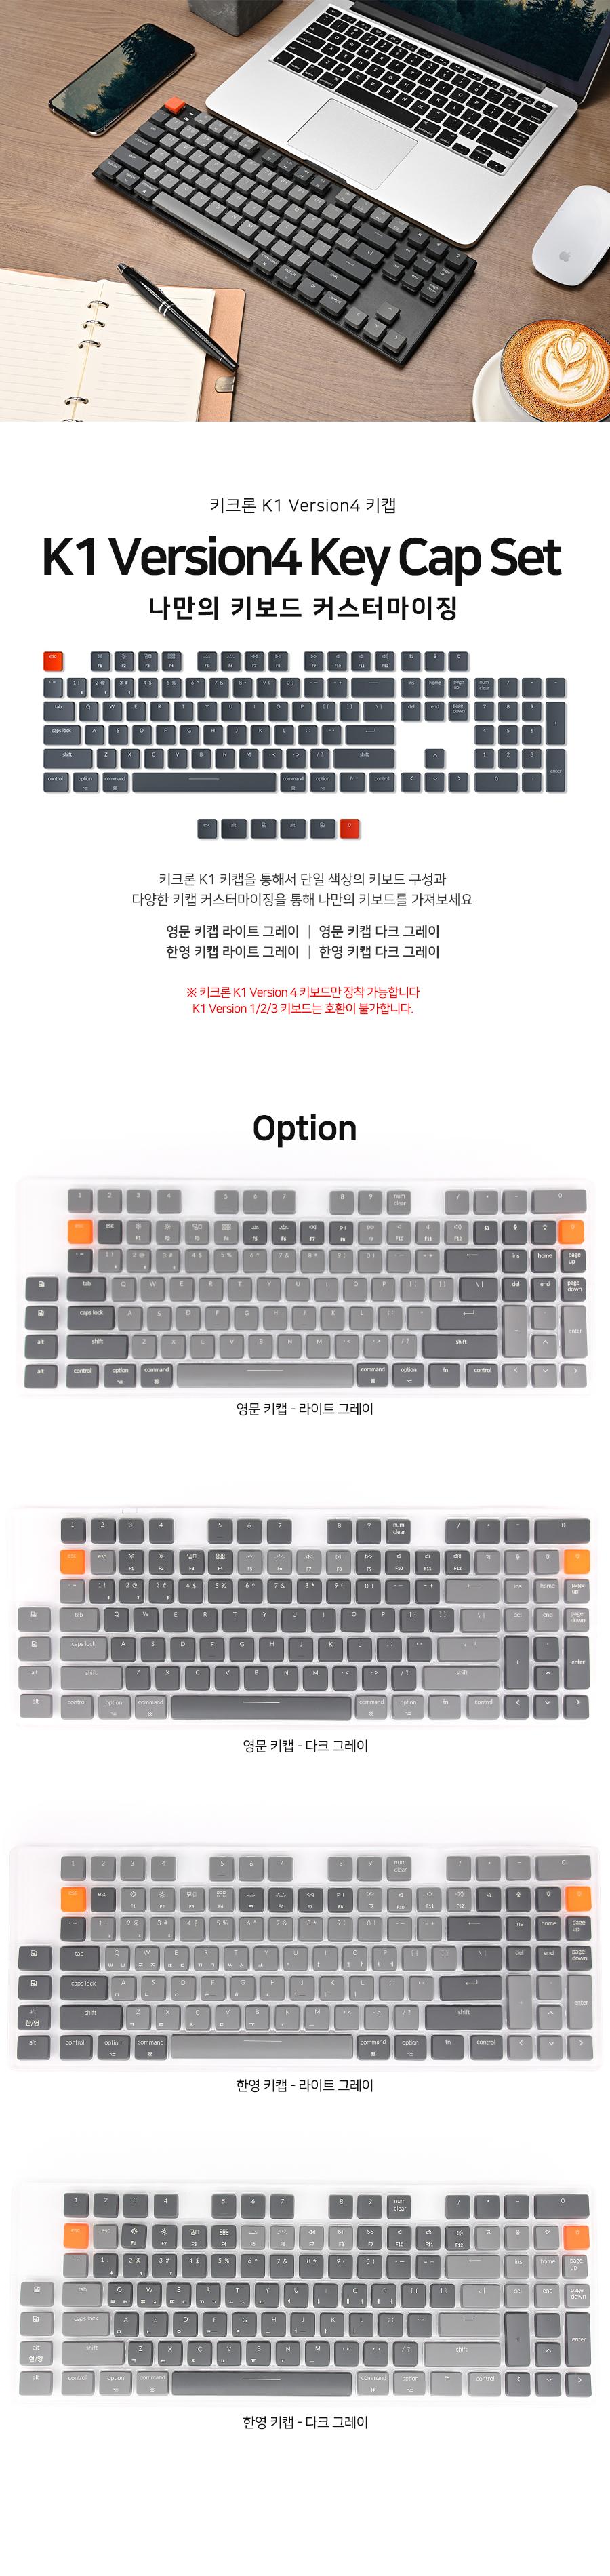 Keychron K1 V4용 키캡 한글 (다크 그레이)